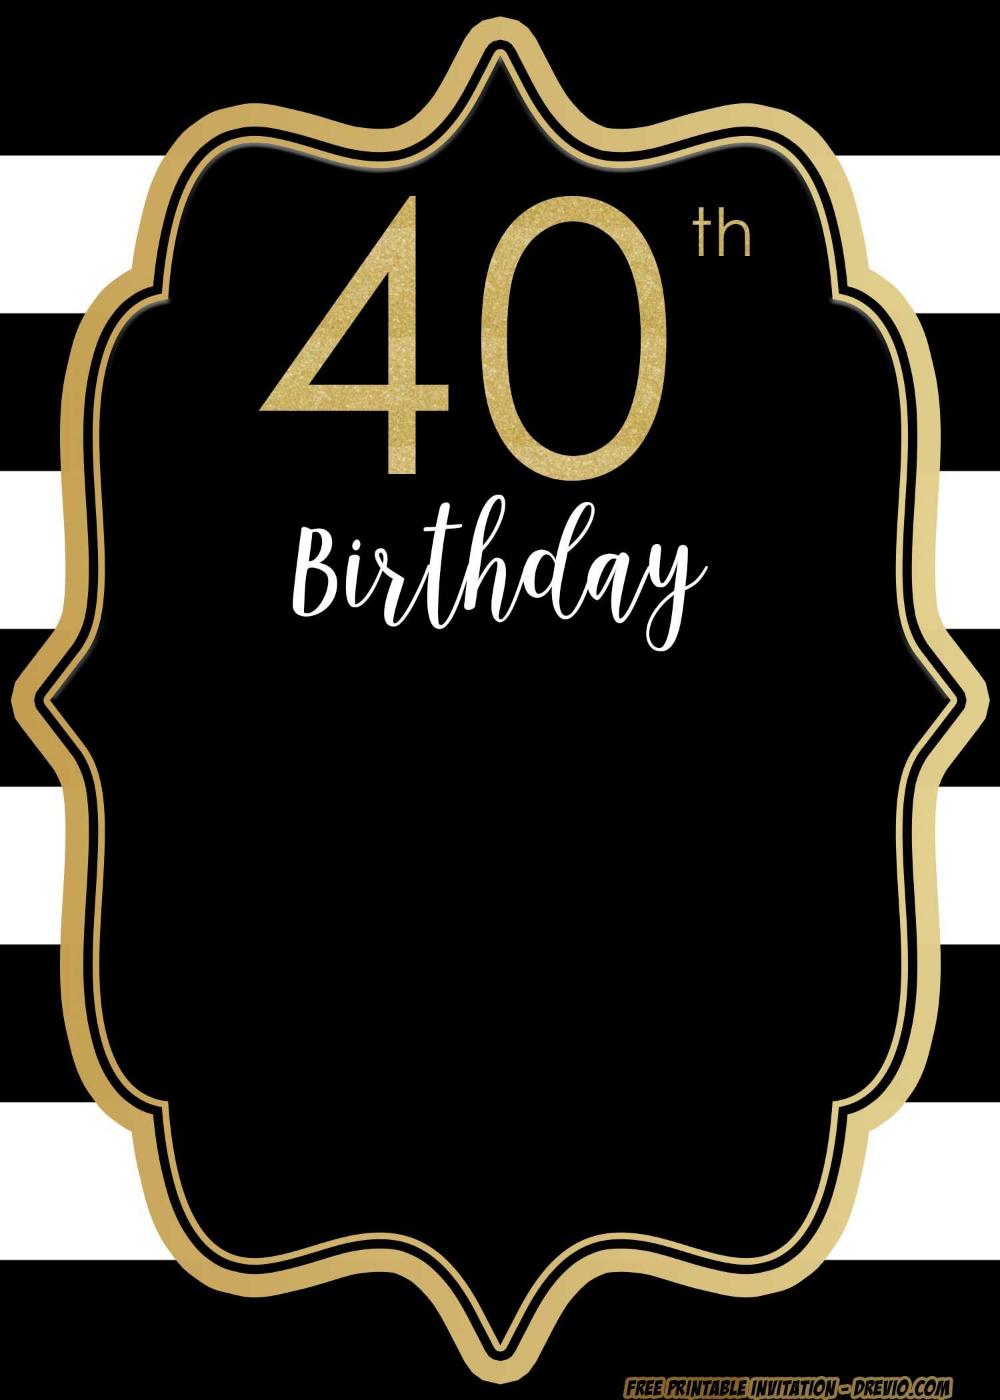 Einladung Geburtstag Einladungskarten 40 Geburtstag Kostenlos Ausdrucken Geburstag Einladungskarten 40 Compleanno Compleanno Maschile Inviti Di Compleanno